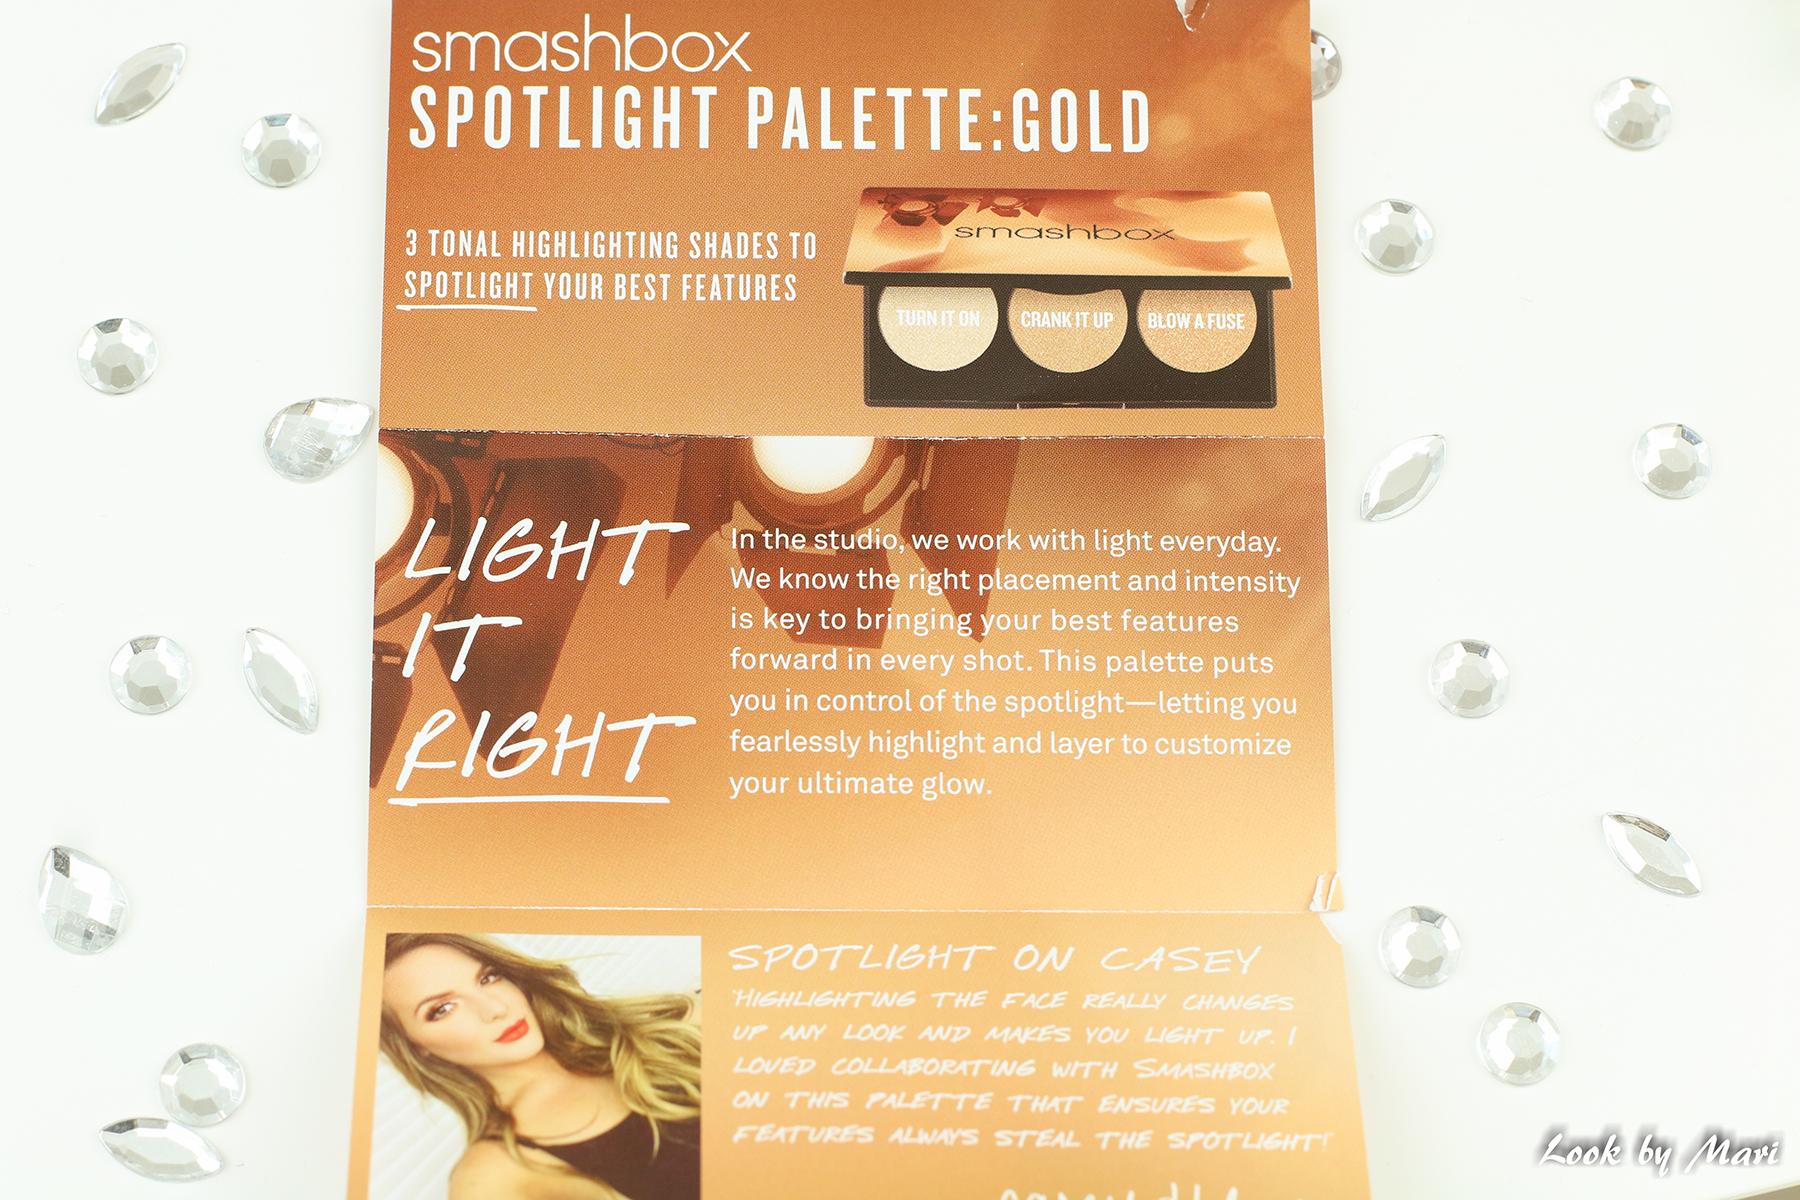 6 smashbox x casey holmes spotlight paletti gold kulta kokemuksia